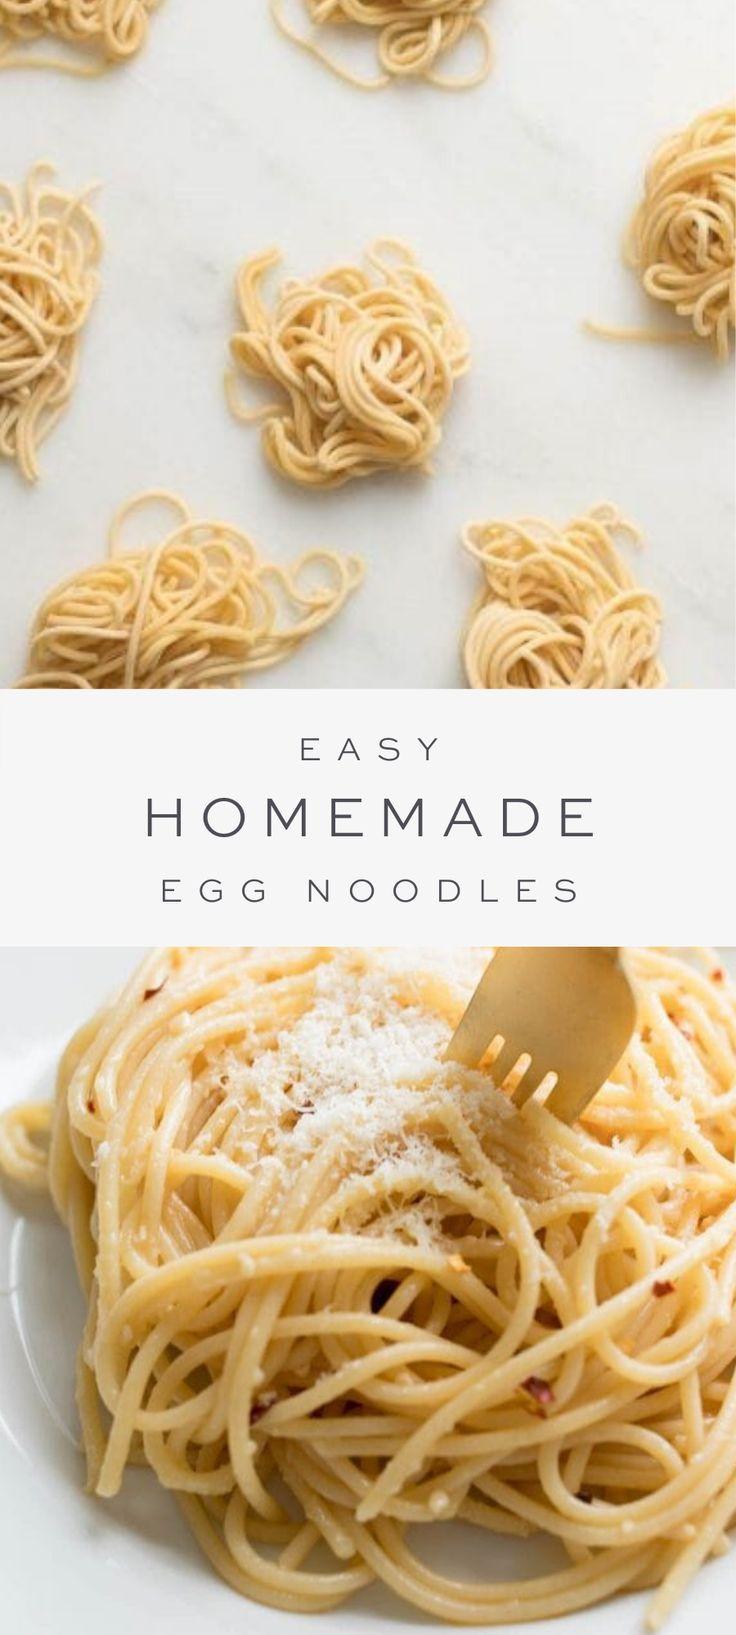 Homemade egg noodles with video julie blanner homemade